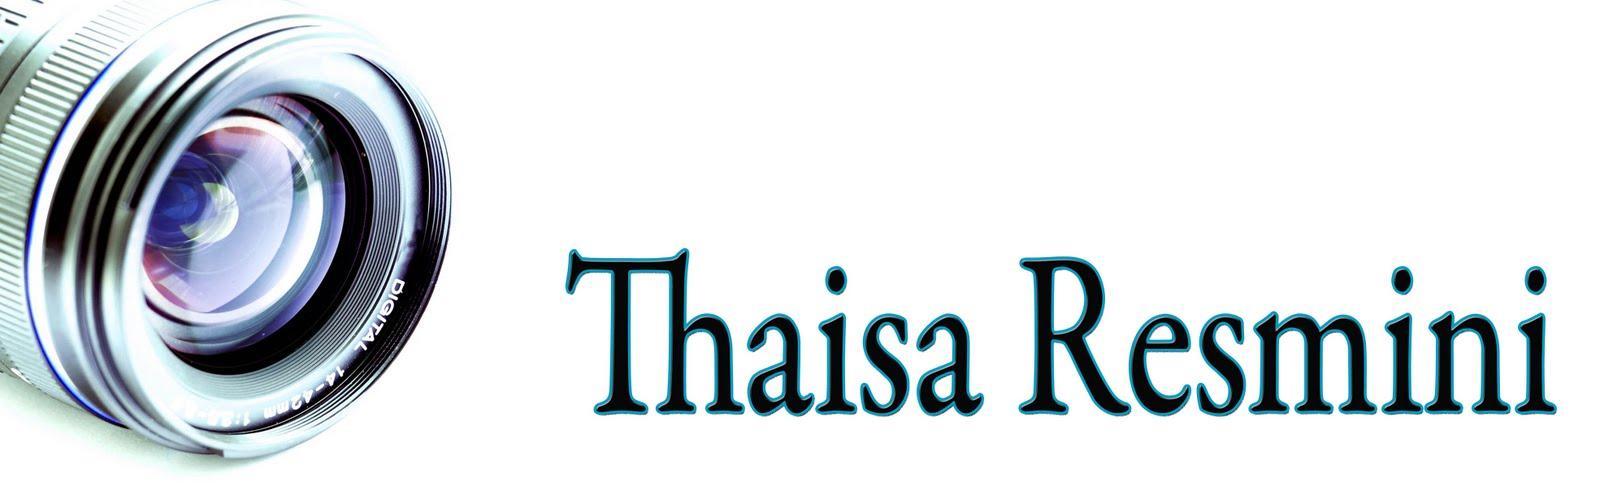 Thaisa Resmini